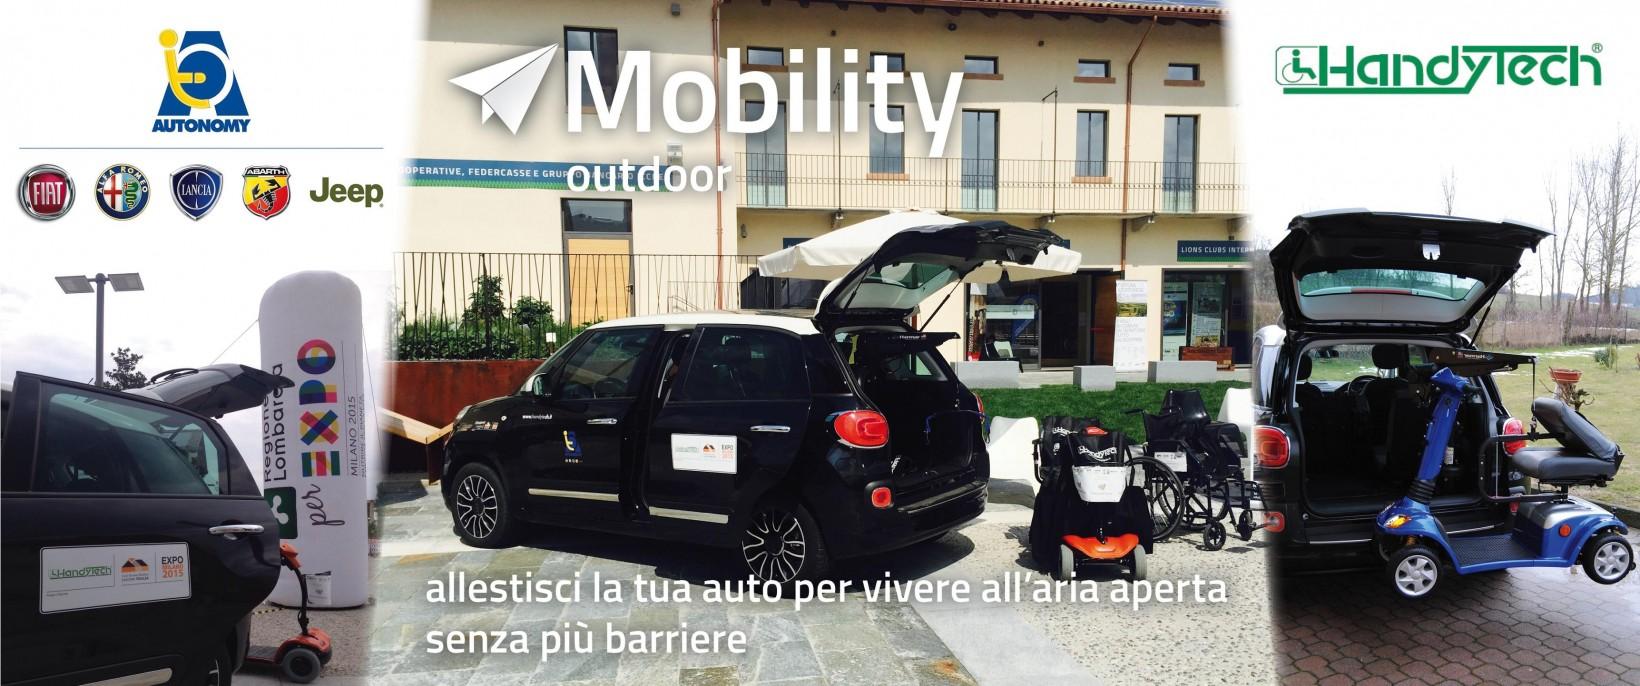 mobility outdoor fiat autonomy